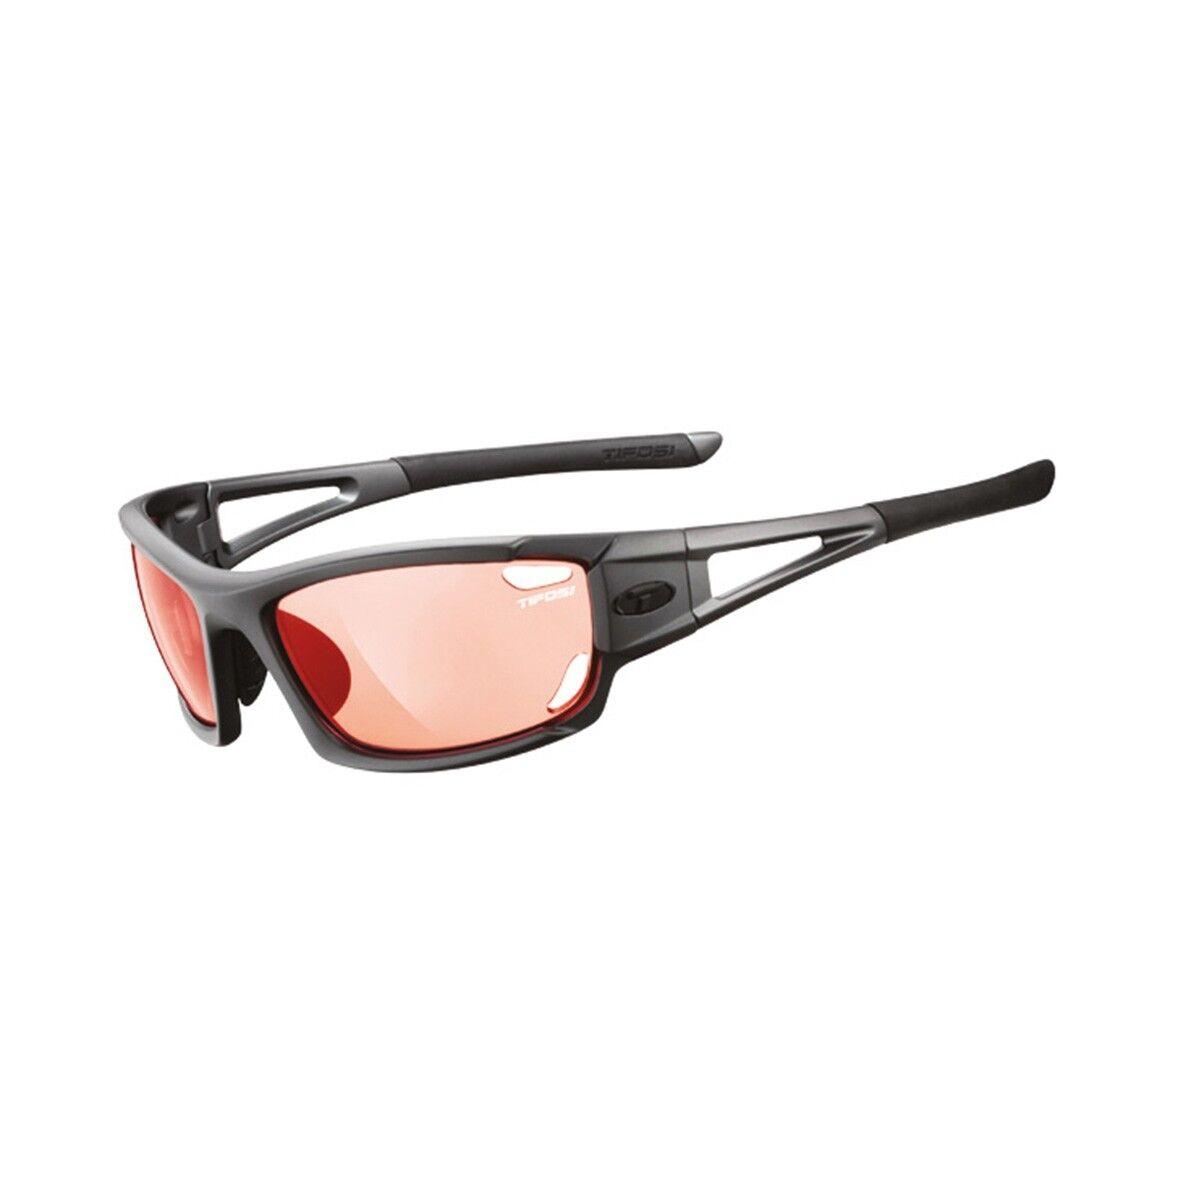 Tifosi Dolomite 2.0 Fototec Sunglasses